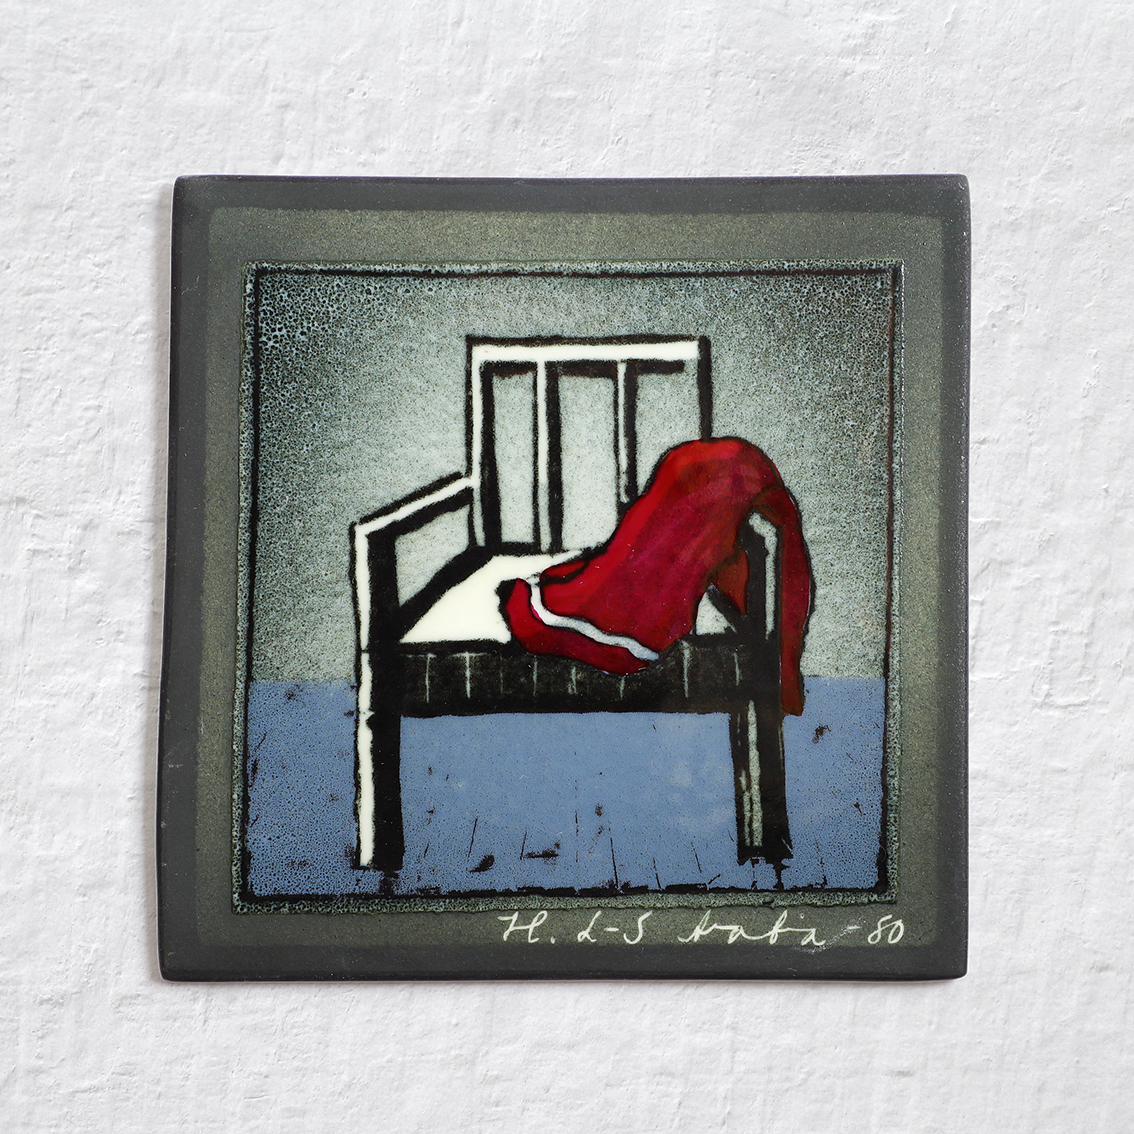 ARABIA アラビア Helja Liukko-Sundstrom ヘルヤ リウッコ スンドストロム 椅子と赤いマフラーの陶板 北欧ヴィンテージ